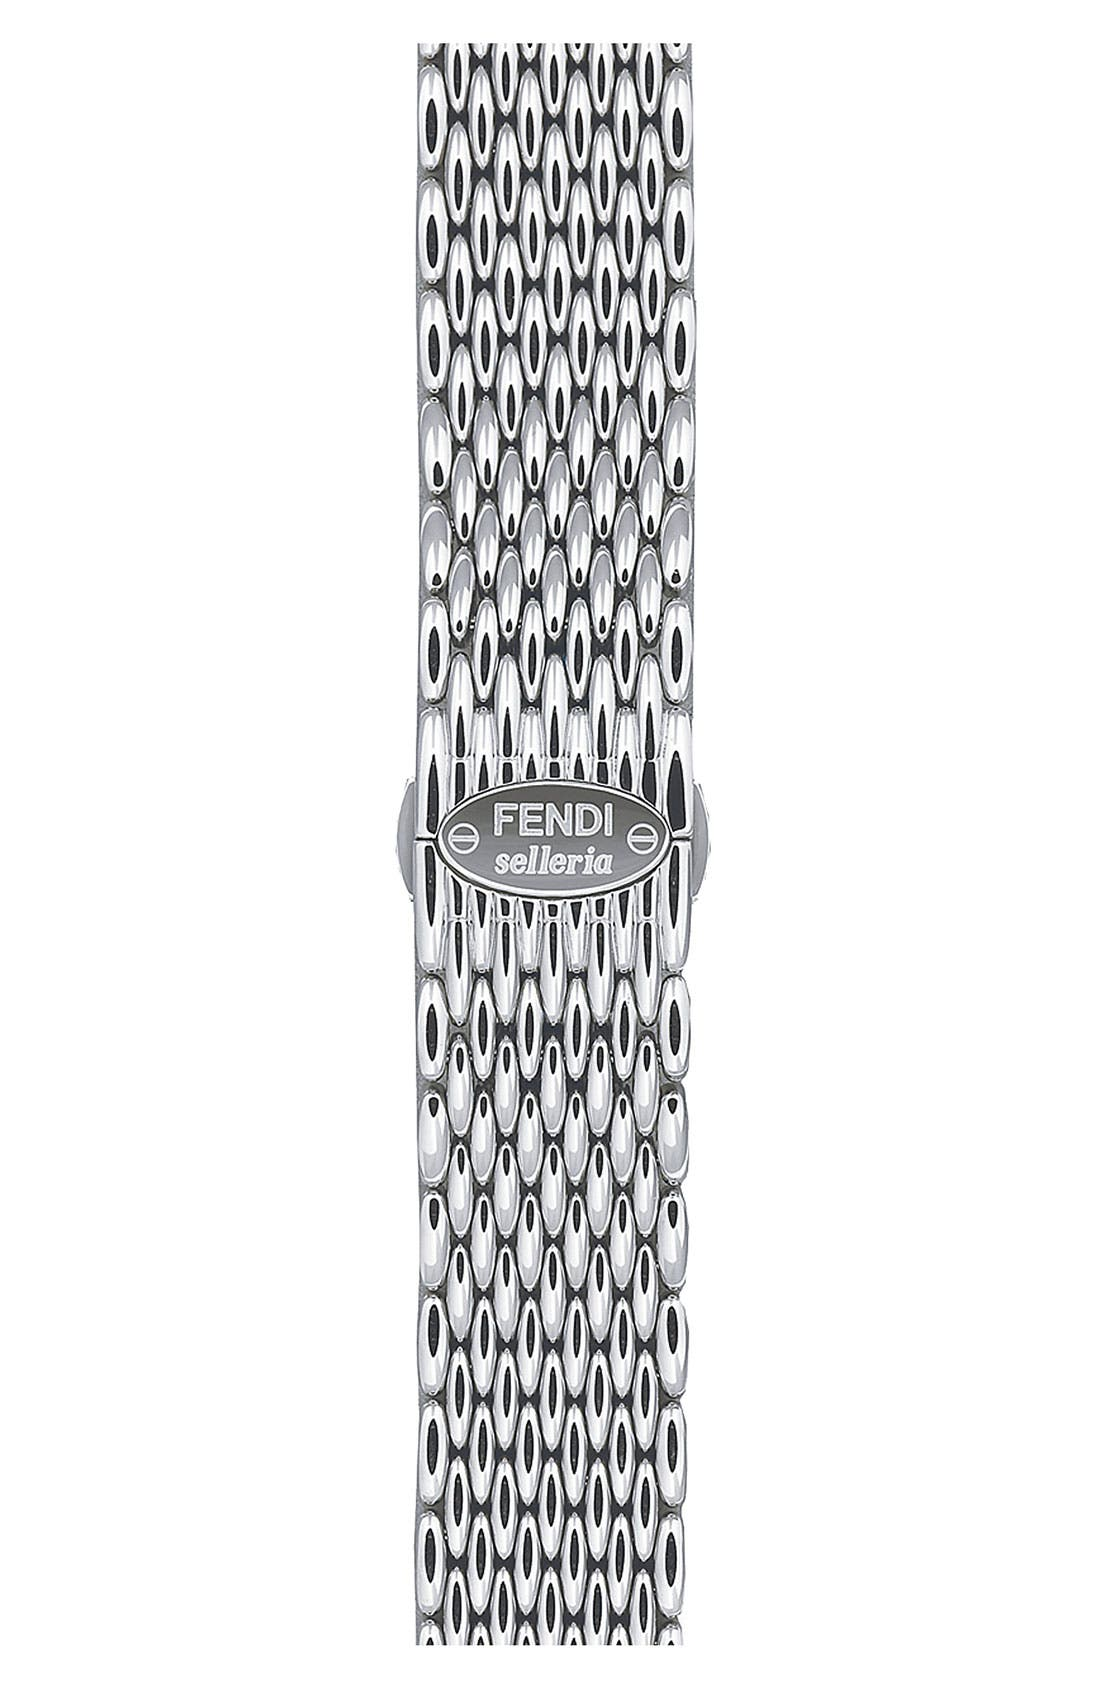 Main Image - Fendi 'Selleria' 18mm Stainless Steel Bracelet Watchband